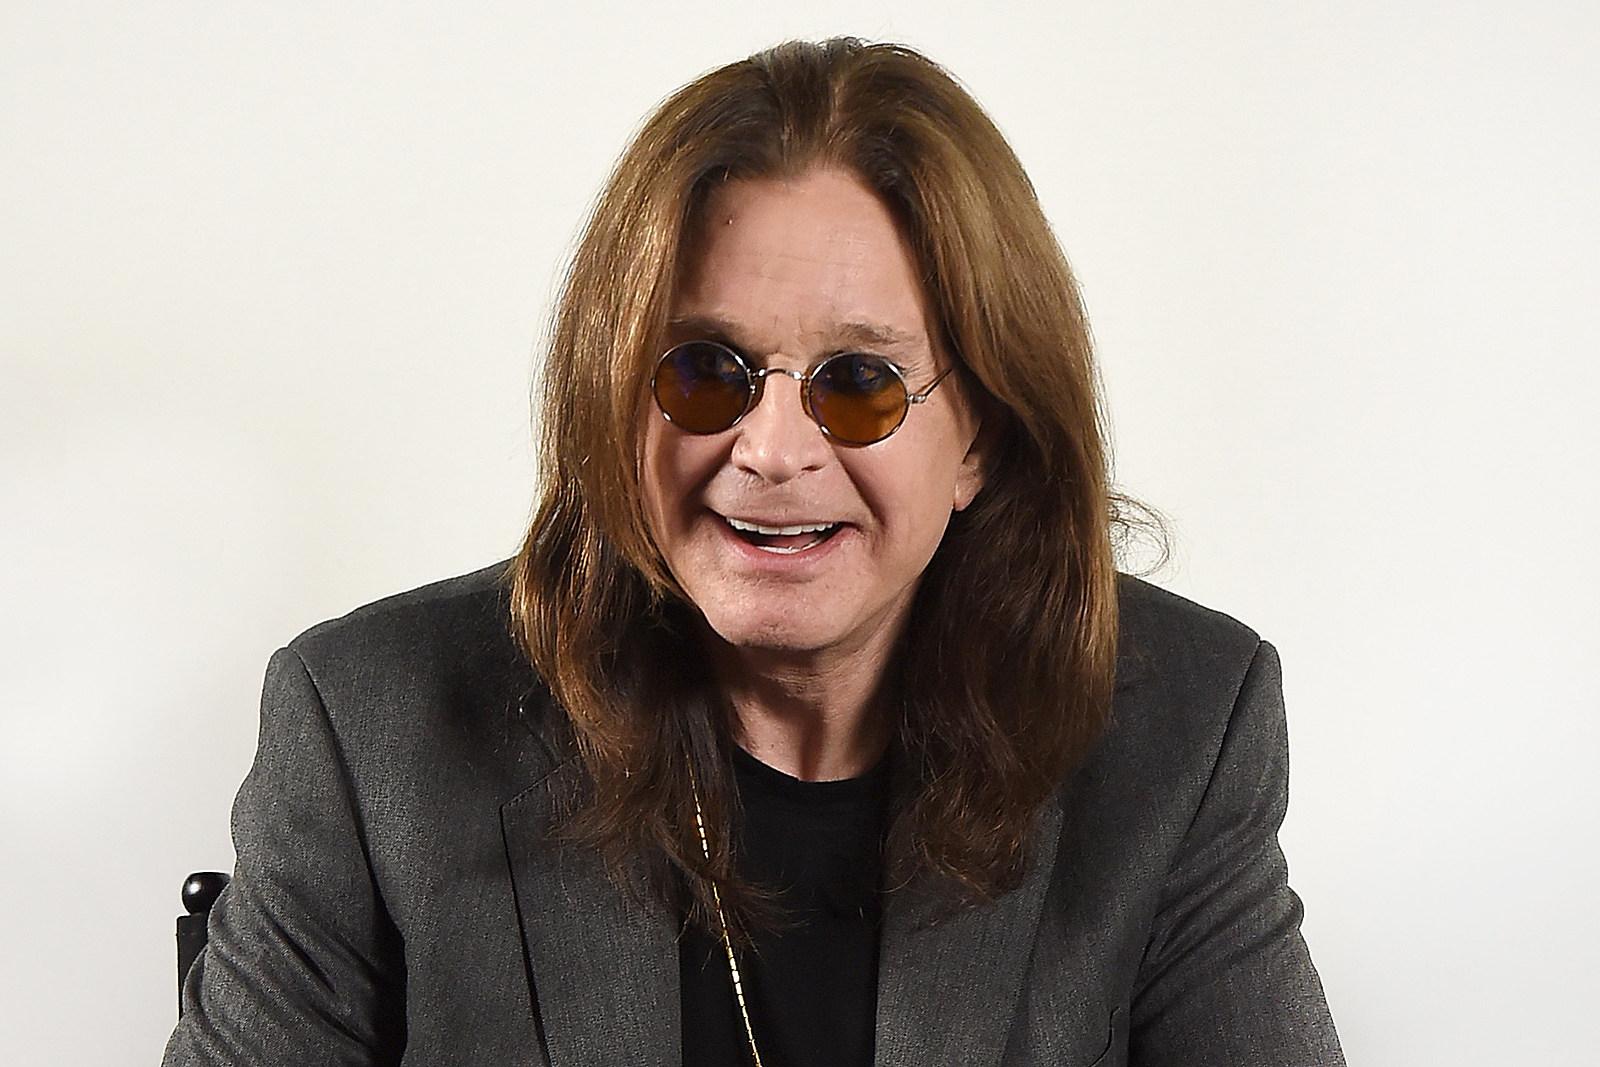 Ozzy Osbourne Postpones European Tour Dates